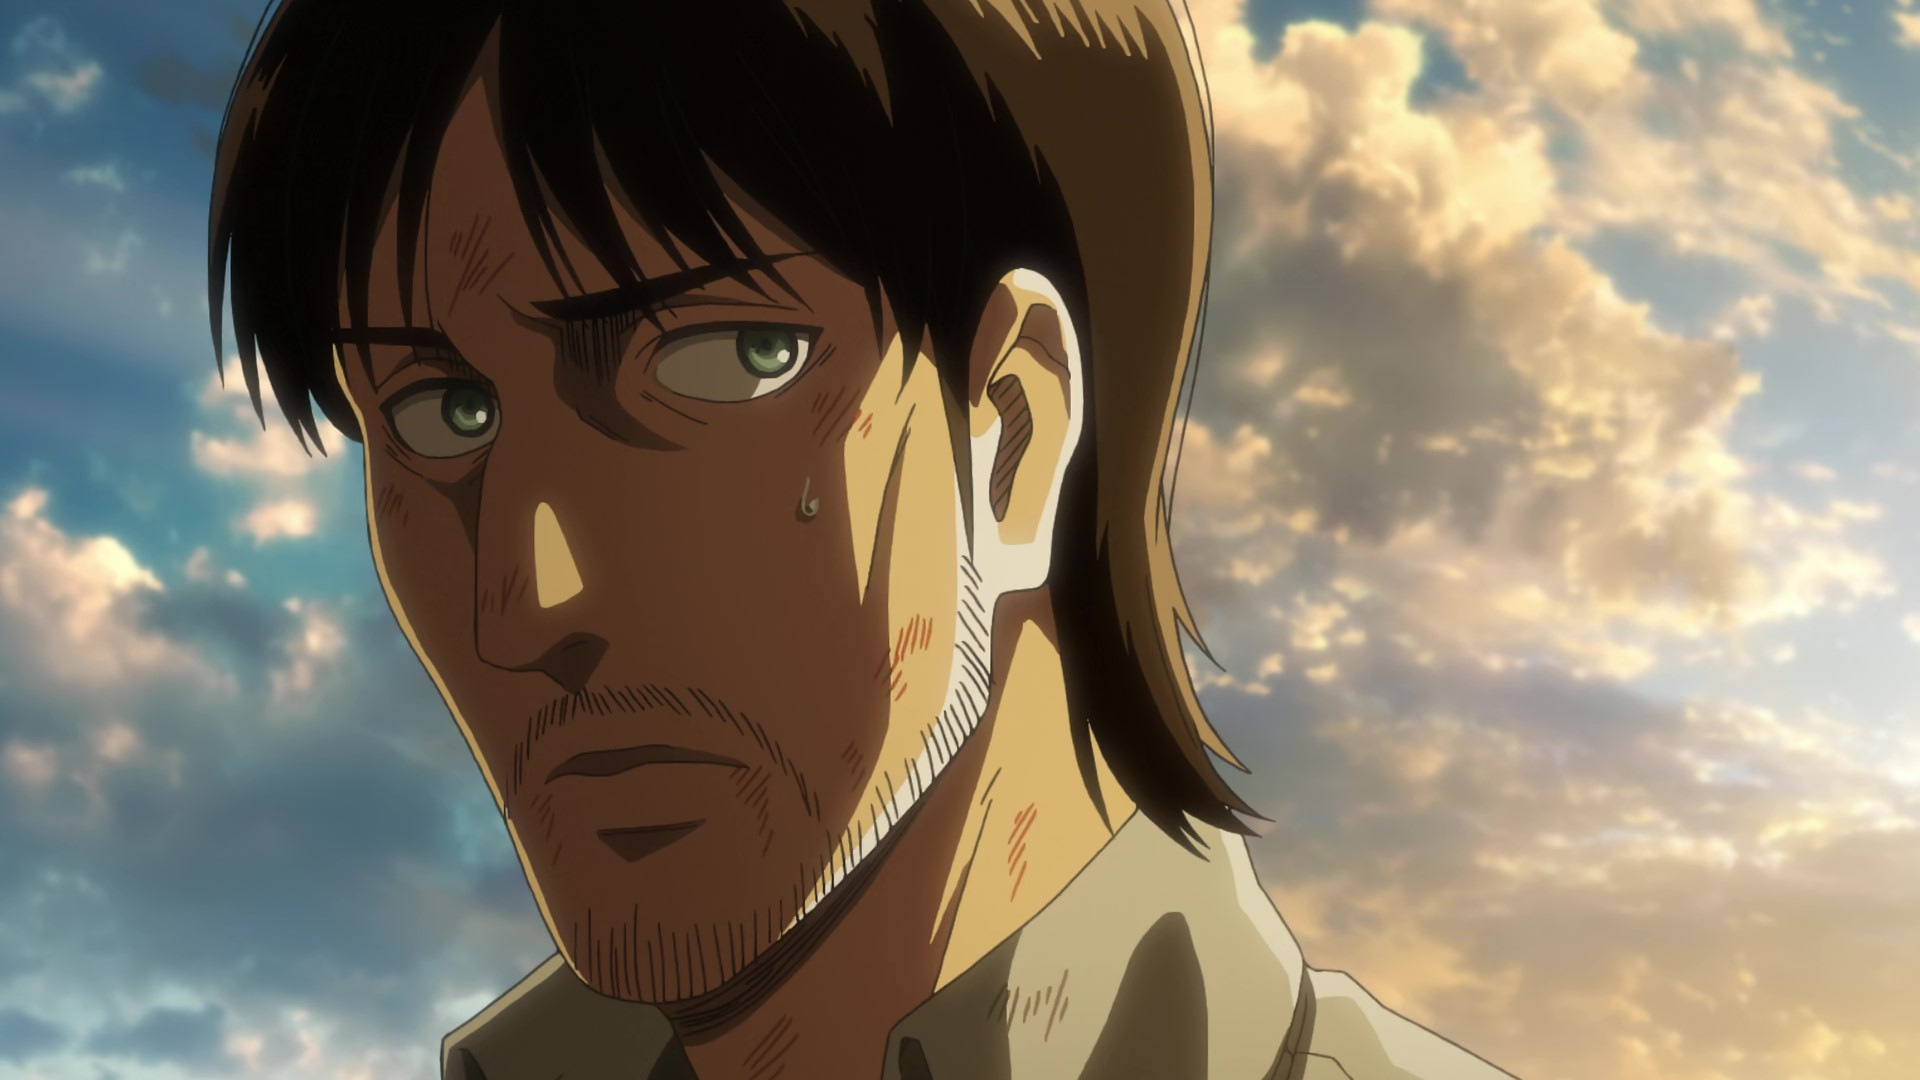 Attack on Titan Season 3 Episode 21 English Dubbed - AnimeGT